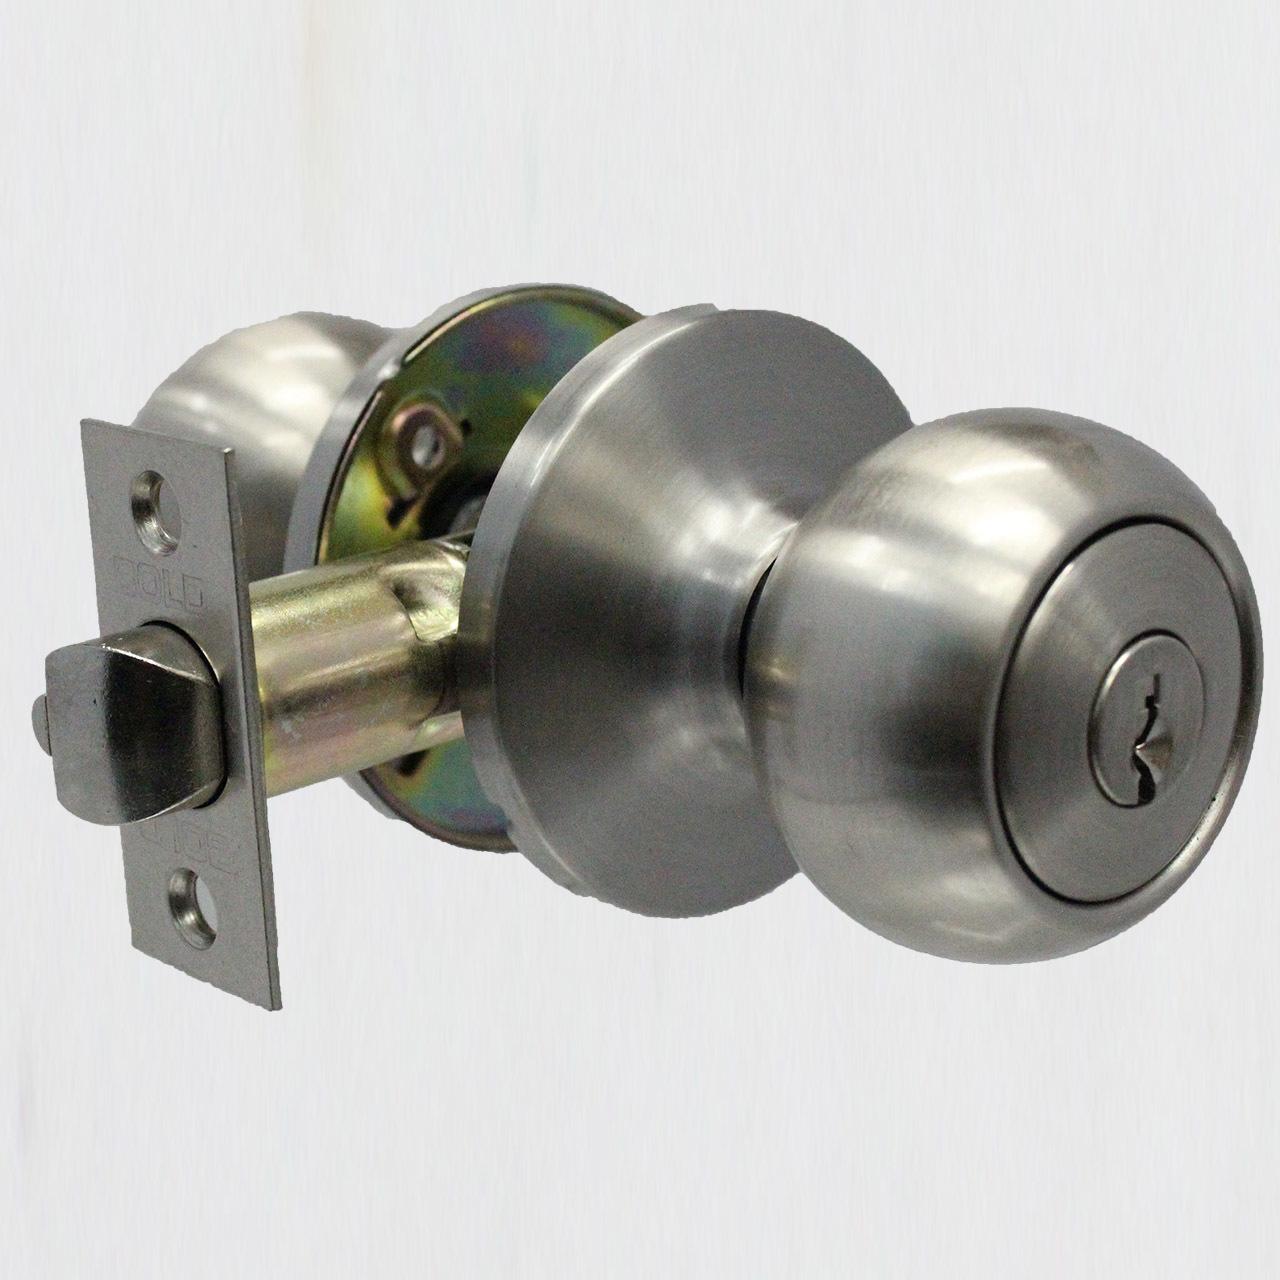 entry door knobs and locks photo - 13